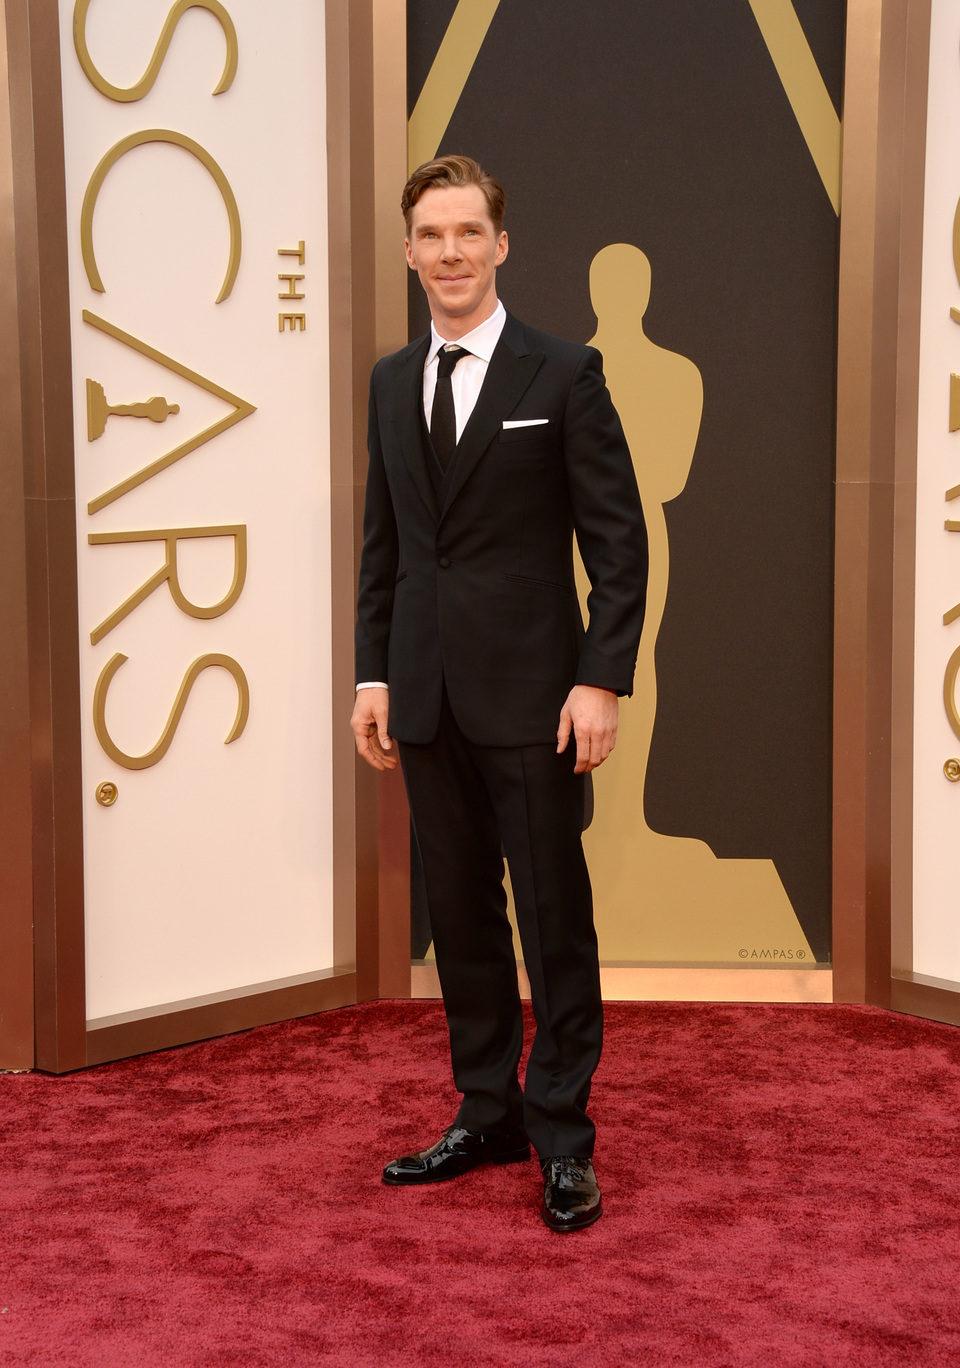 Benedict Cumberbatch en la alfombra roja de los Oscar 2014